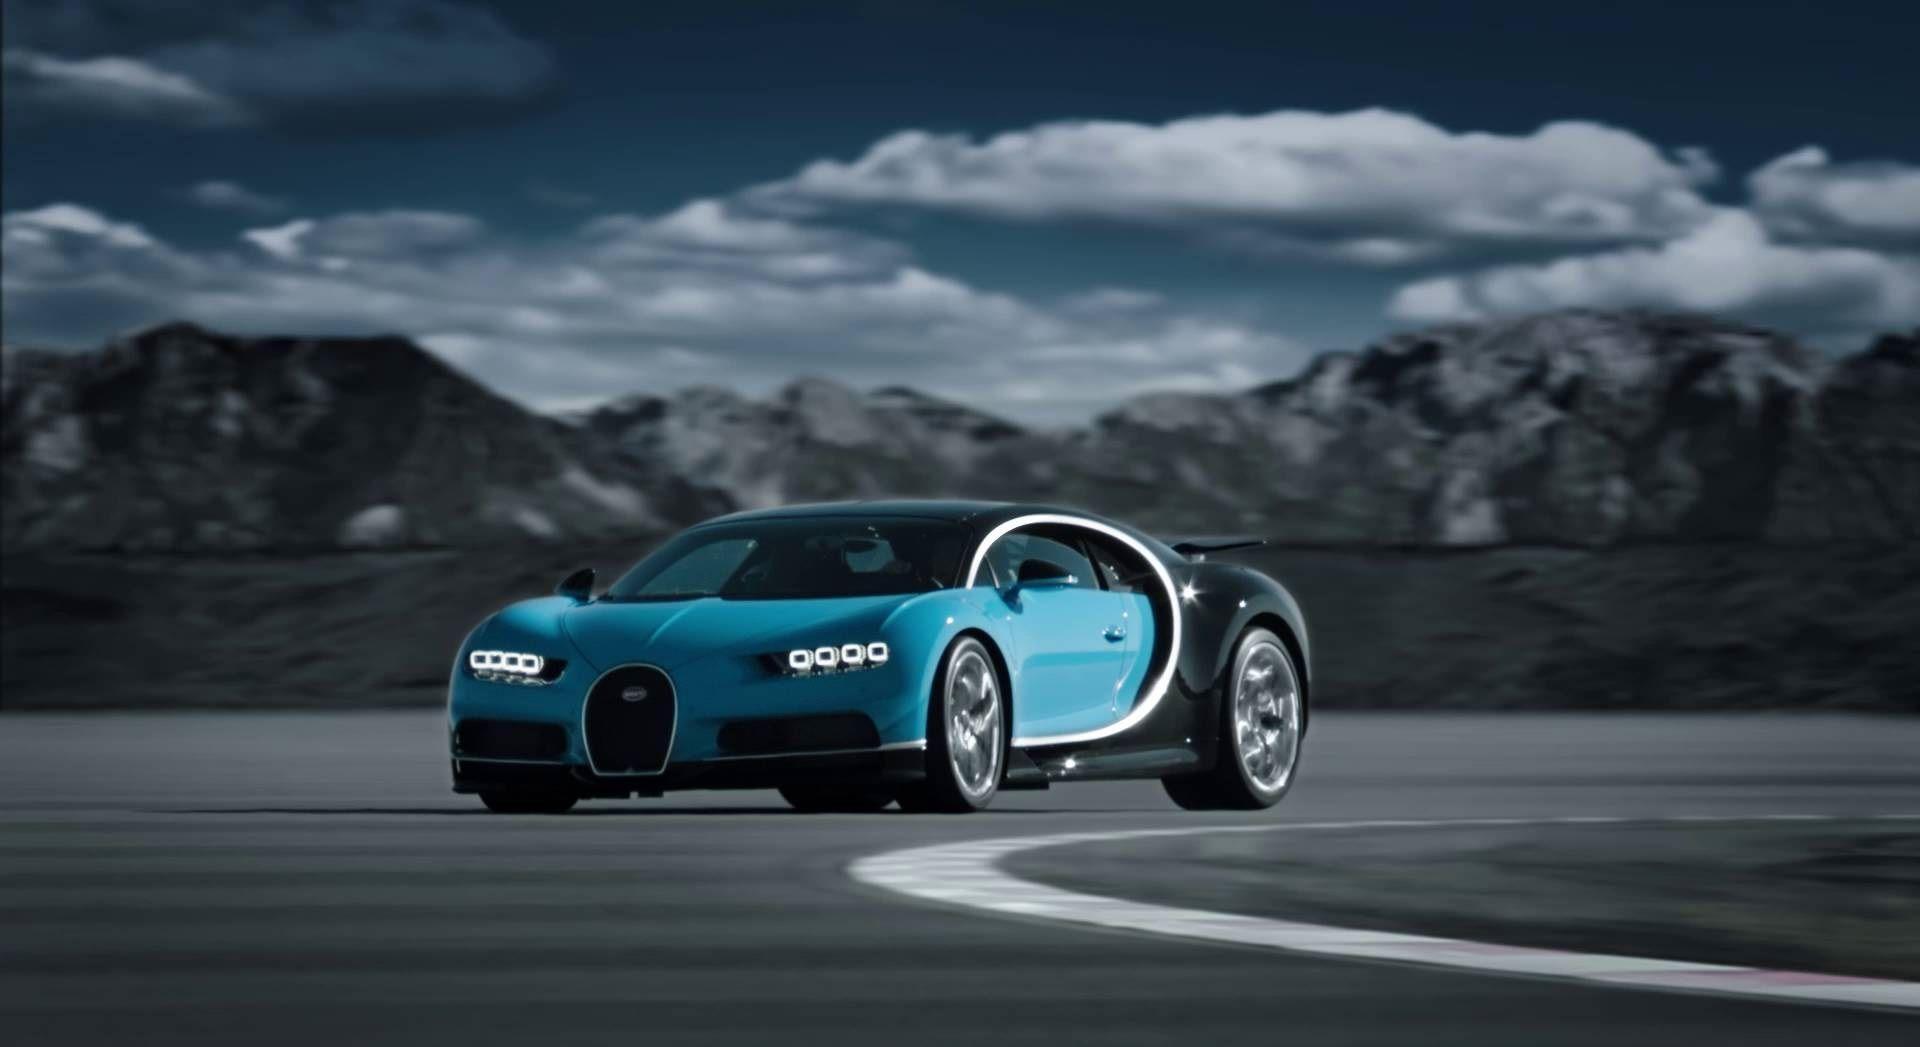 Bugatti Chiron 2018 Wallpapers Wallpaper Cave